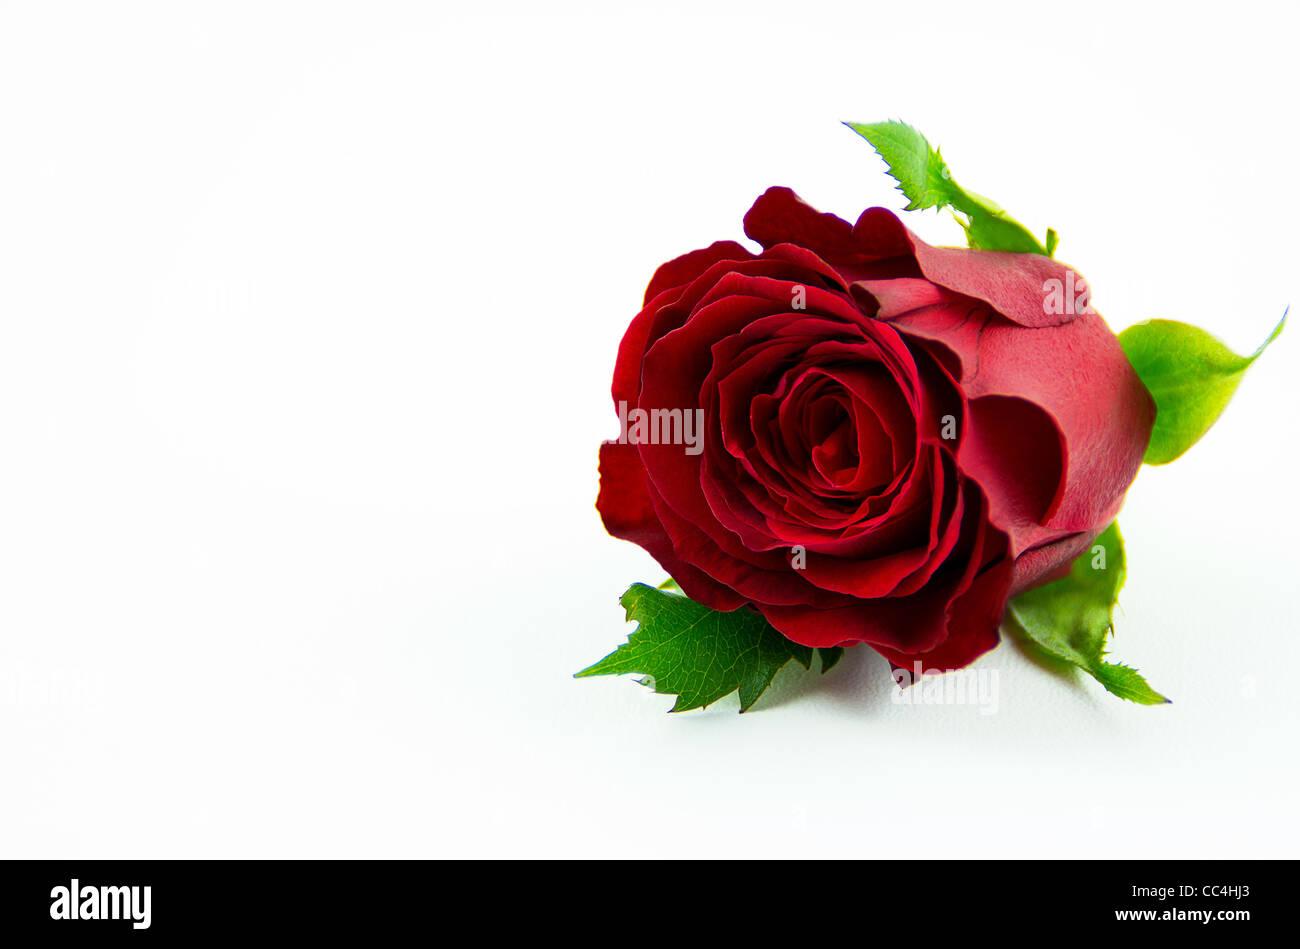 Inglese floreale unico Red Rose Immagini Stock